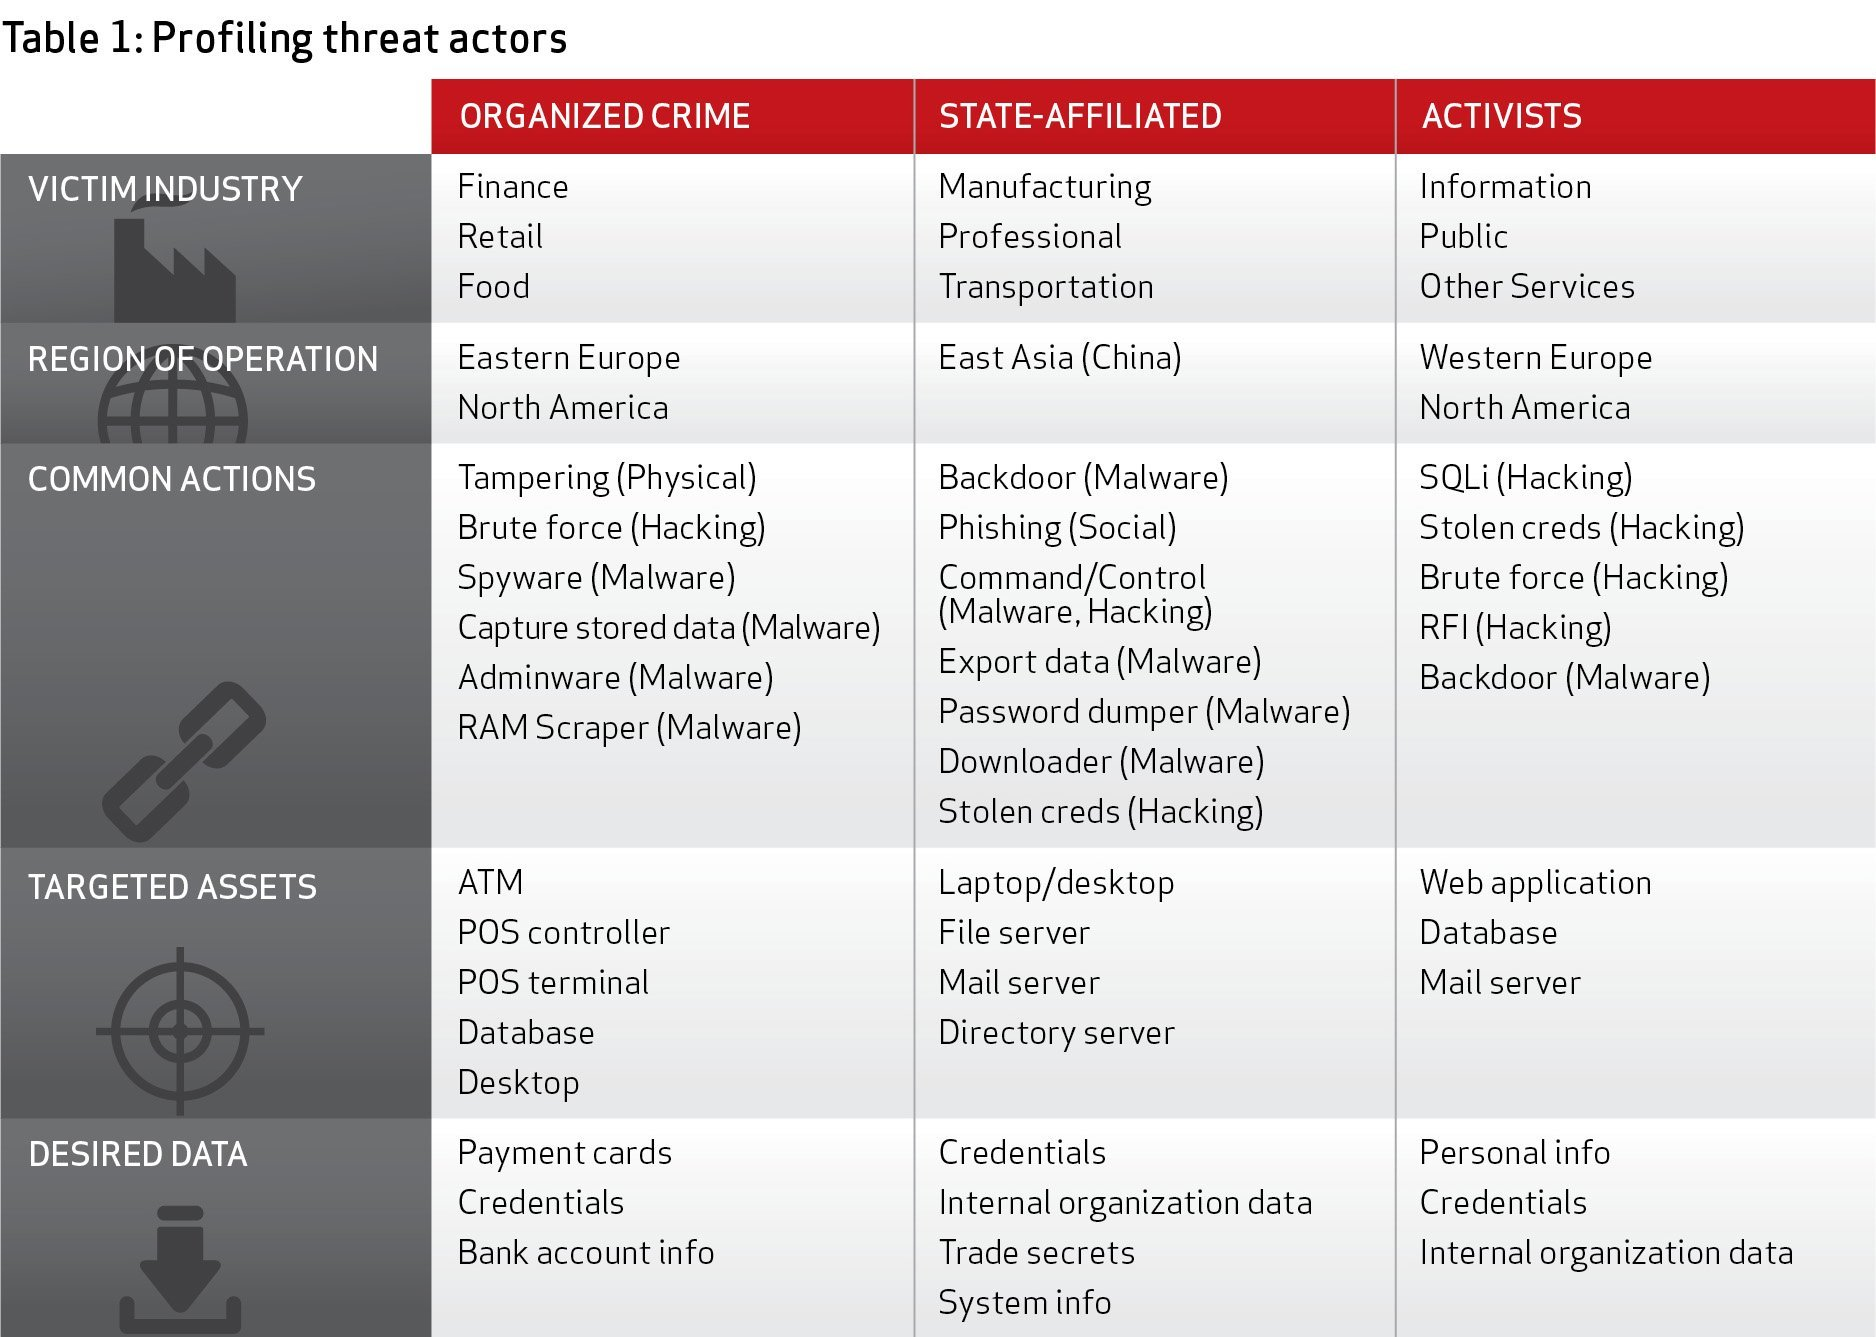 Verizon data breach report 2013: Data shows need for risk awareness